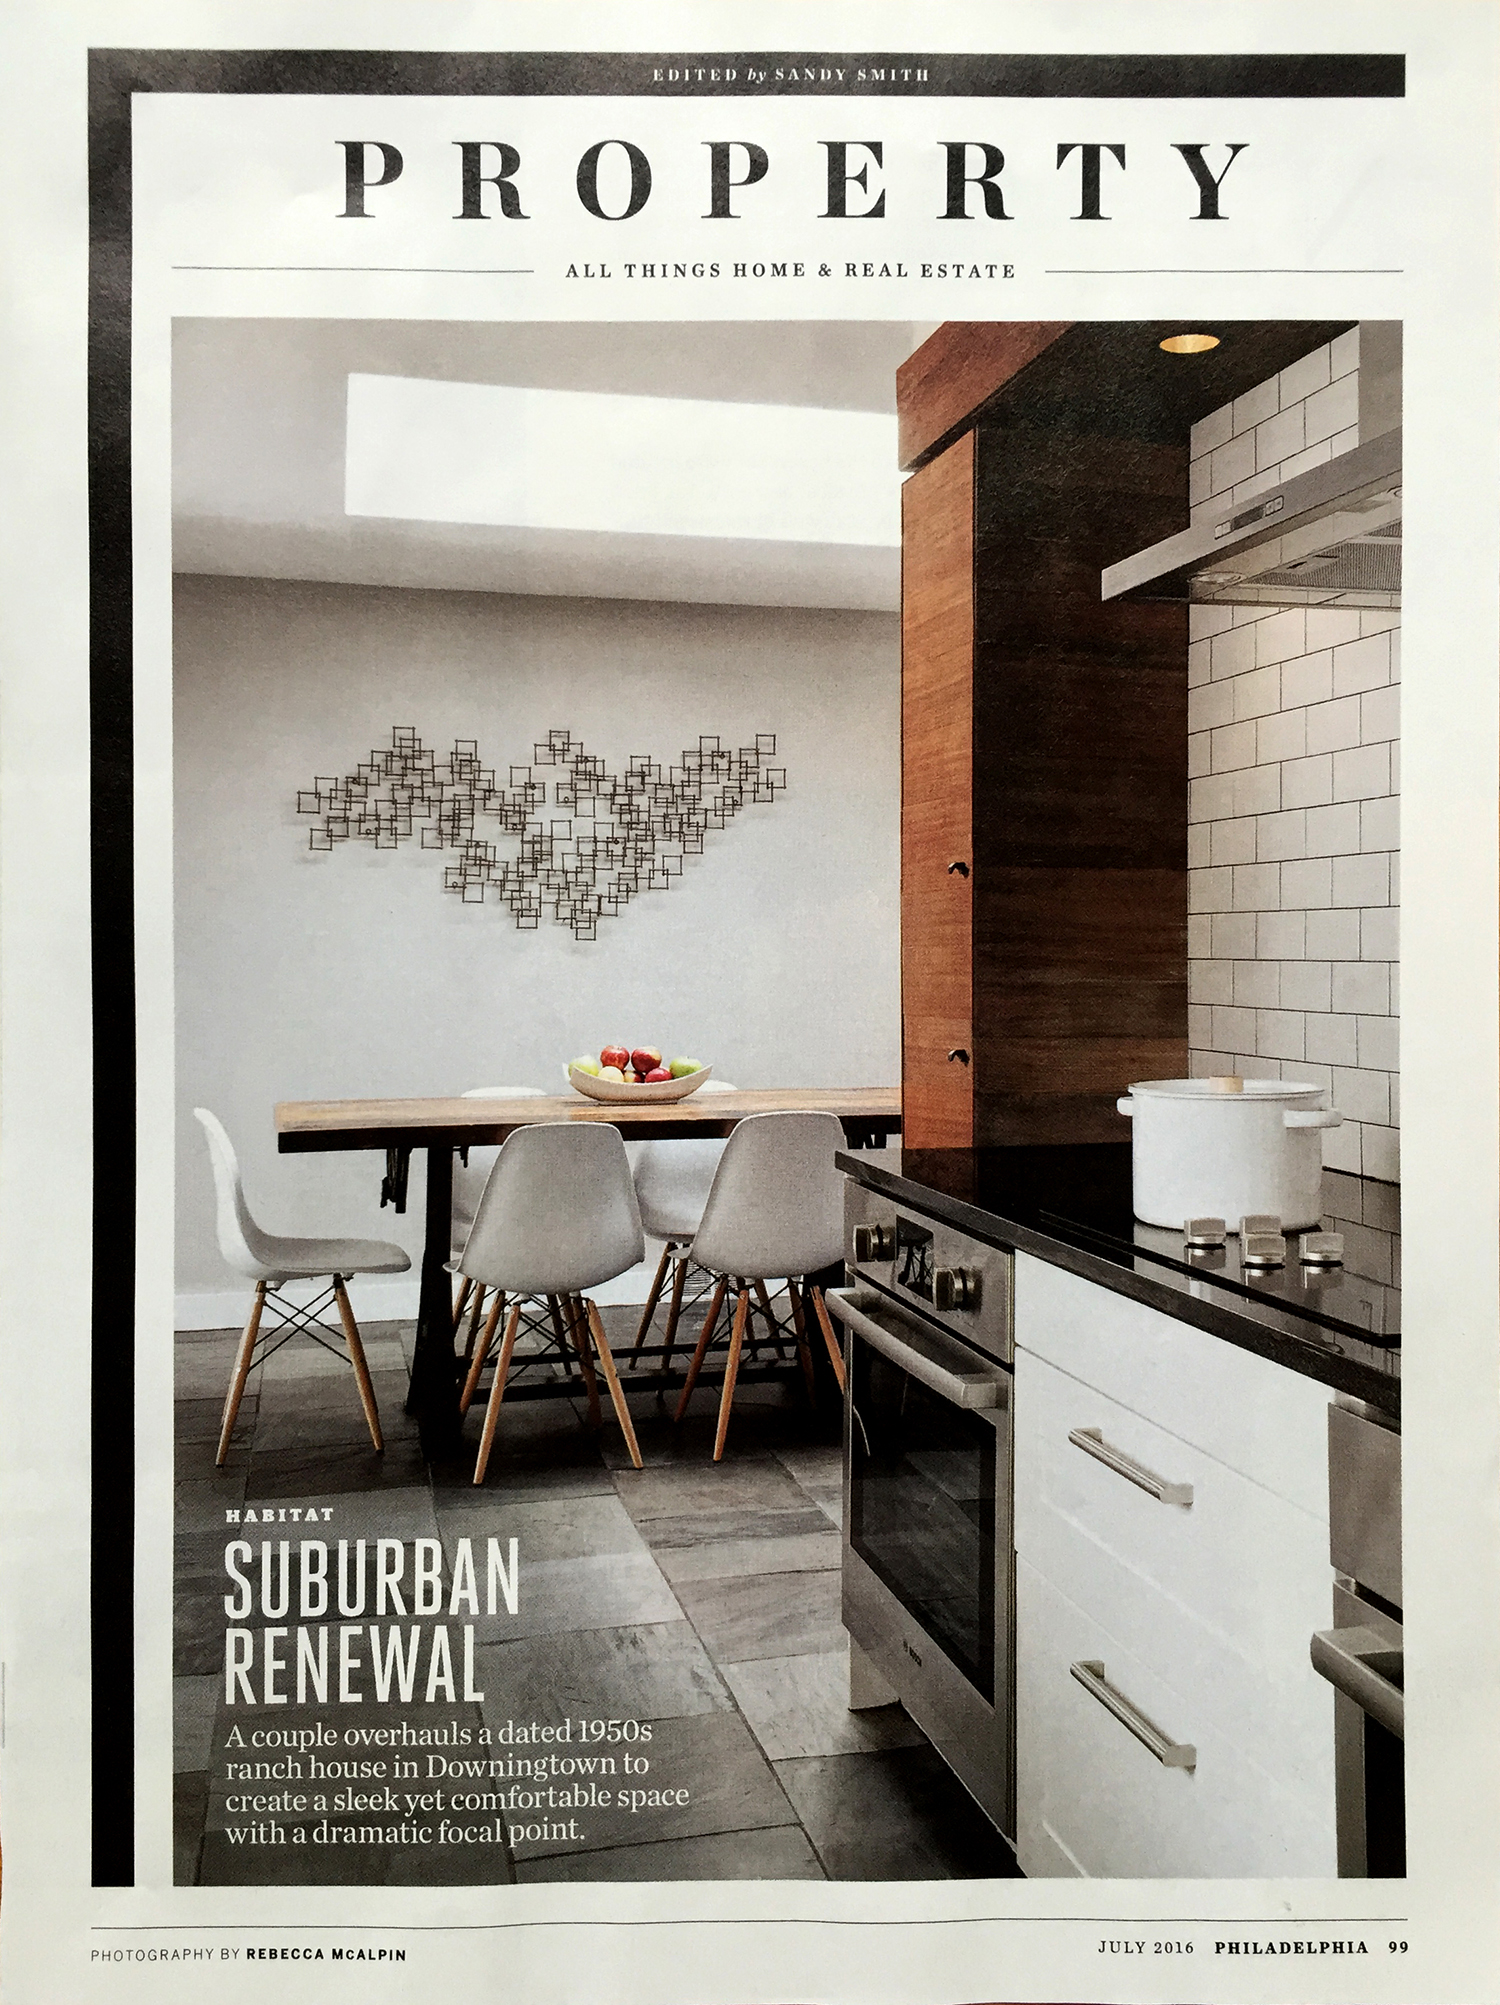 PAK-HUFFMAN RESIDENCE featured in Philadelphia Magazine